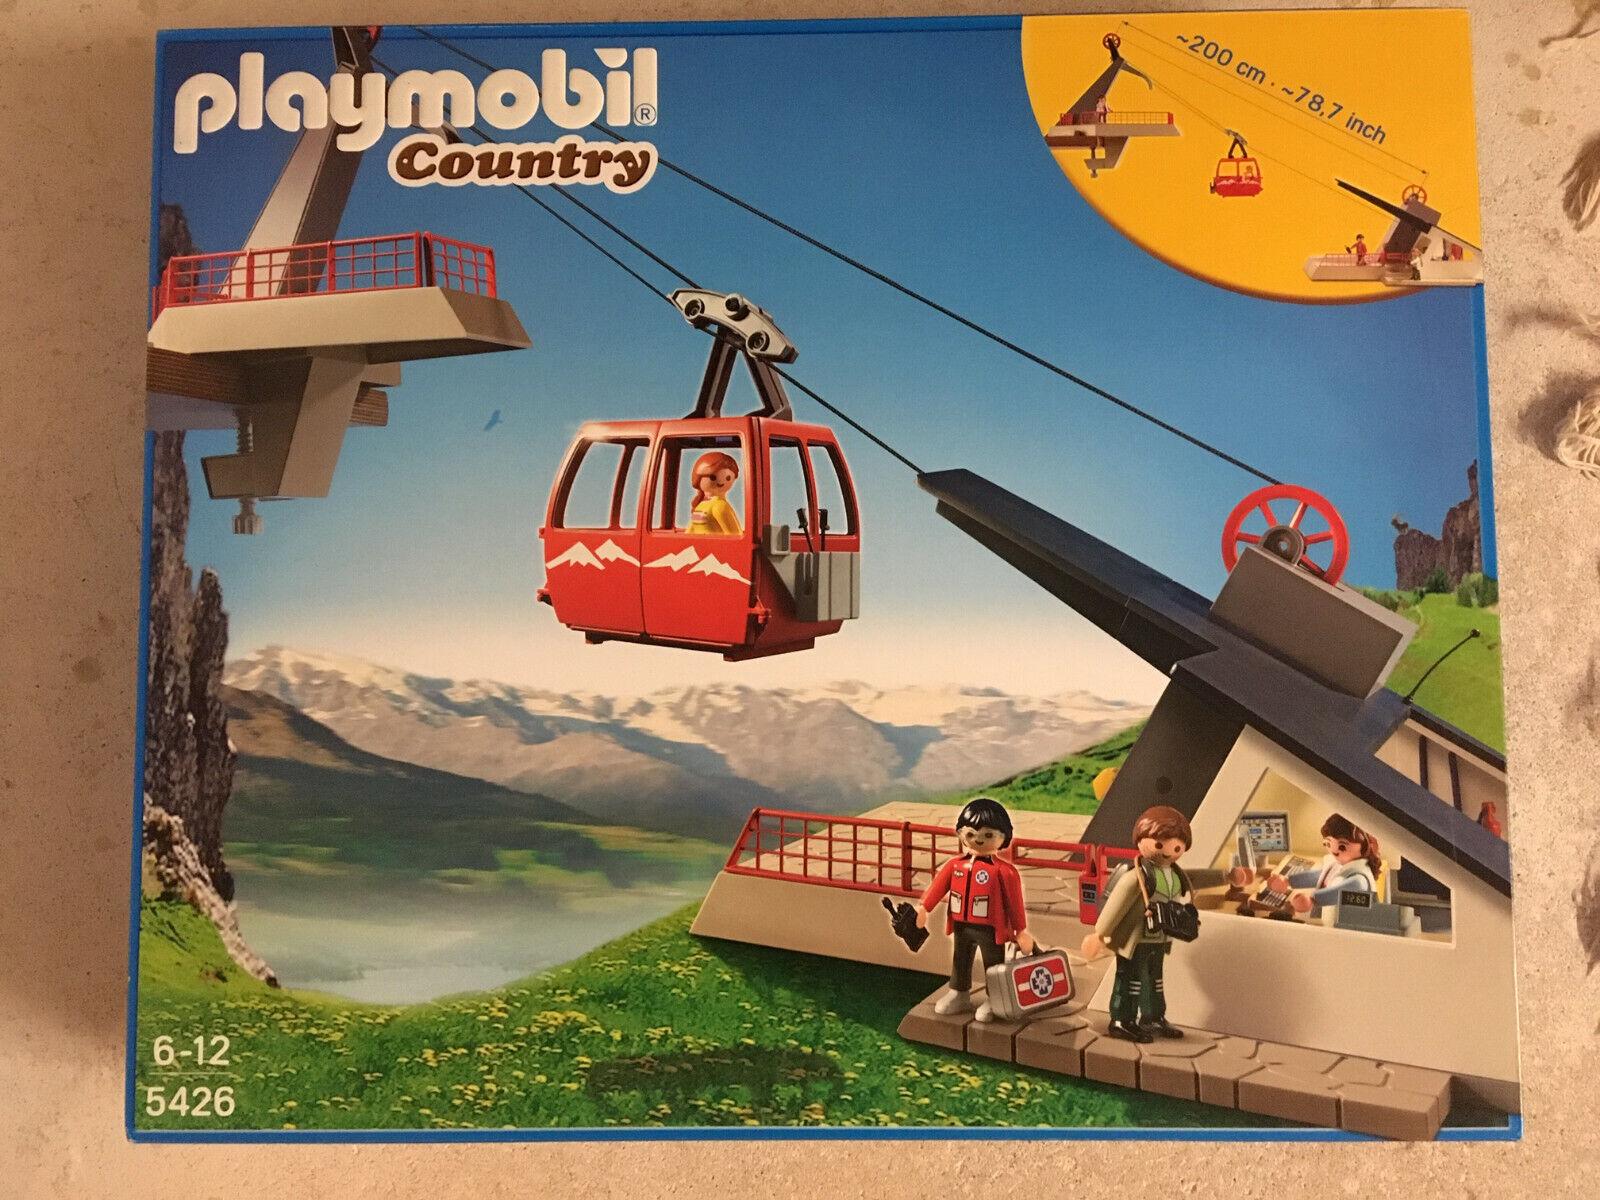 Playmobil 5426 Bergbahn Seilbahn Country NEU  ungeöffnet